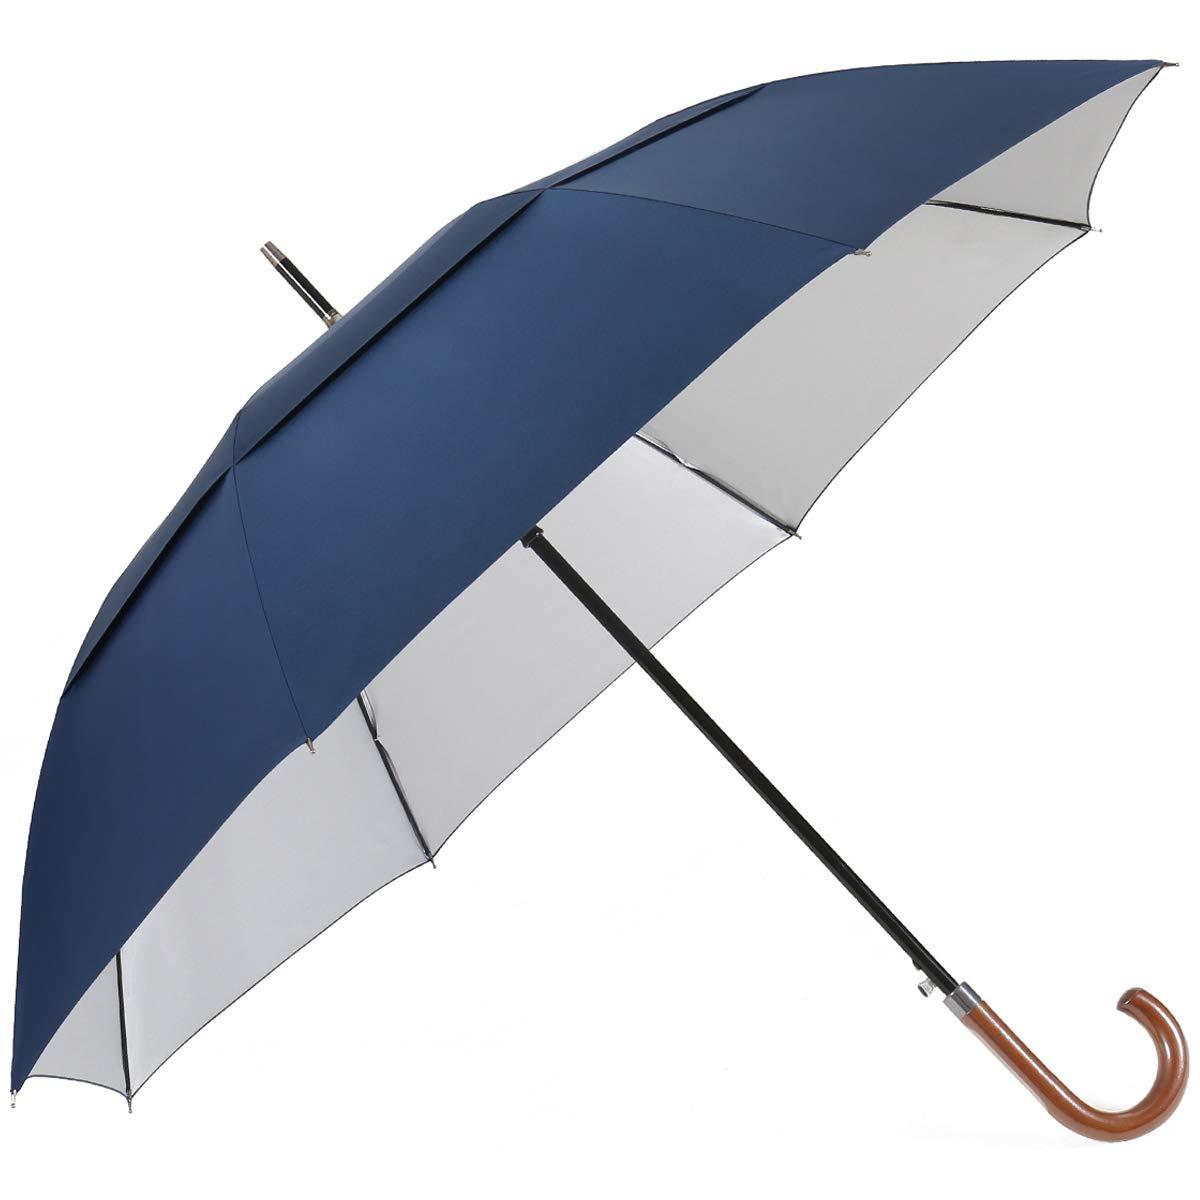 G4Free UV Hook Golf Umbrella UPF50 54inch Windproof Auto Open Large Oversized Double Canopy Vented Cane Stick Sun Block Umbrellas Men Women(Navy Blue) by G4Free